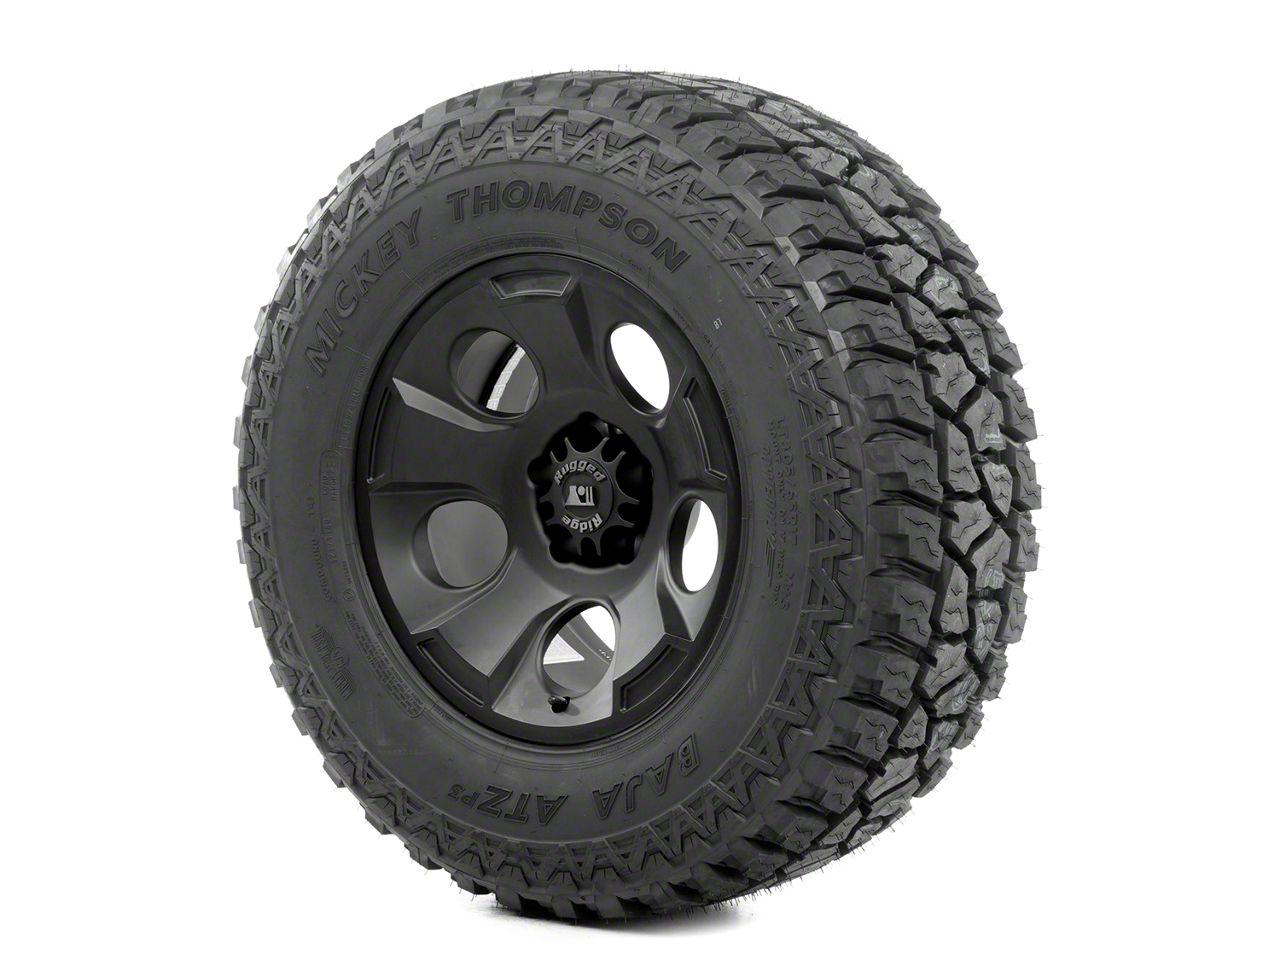 Rugged Ridge Drakon Wheel 17x9 Black Satin and Mickey Thompson ATZ P3 315/70R17 Tire Kit (07-12 Jeep Wrangler JK)